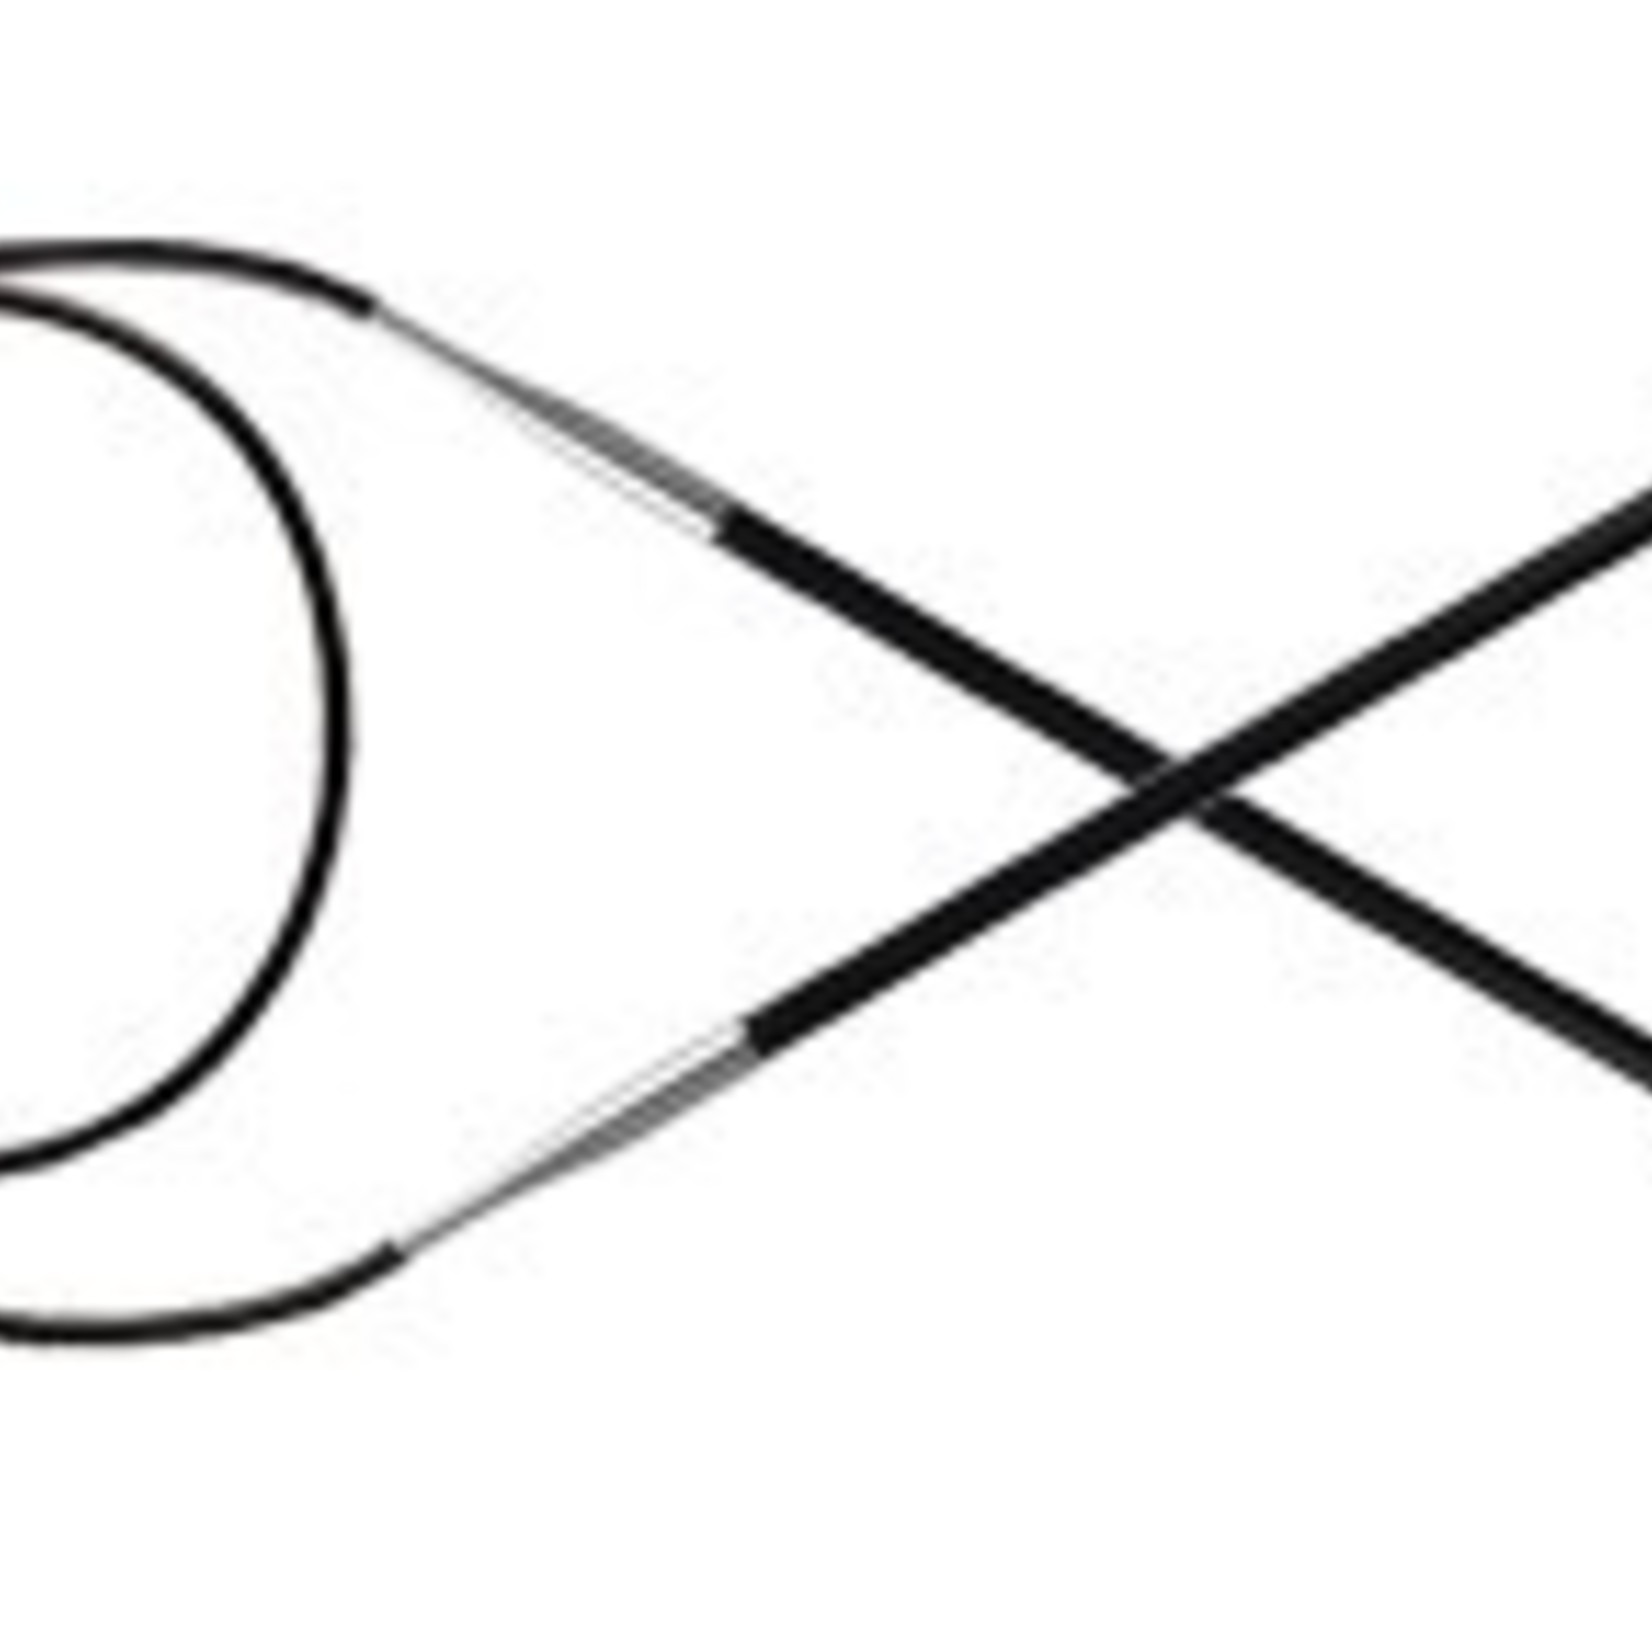 Knitter's Pride 2.5 Karbonz Circular 32